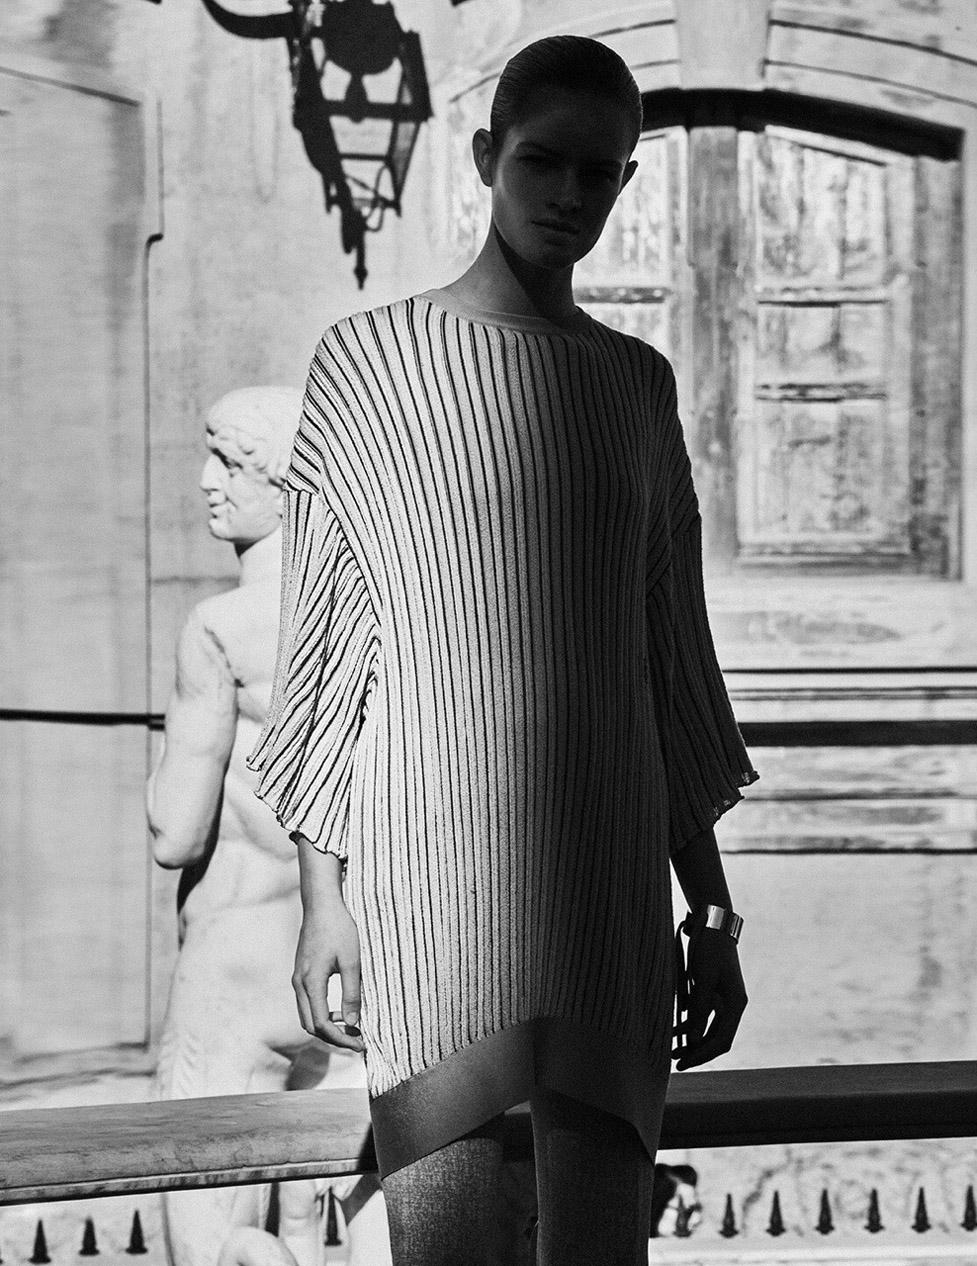 Sophia Roetz by Txema Yeste / Vogue Spain february 2019